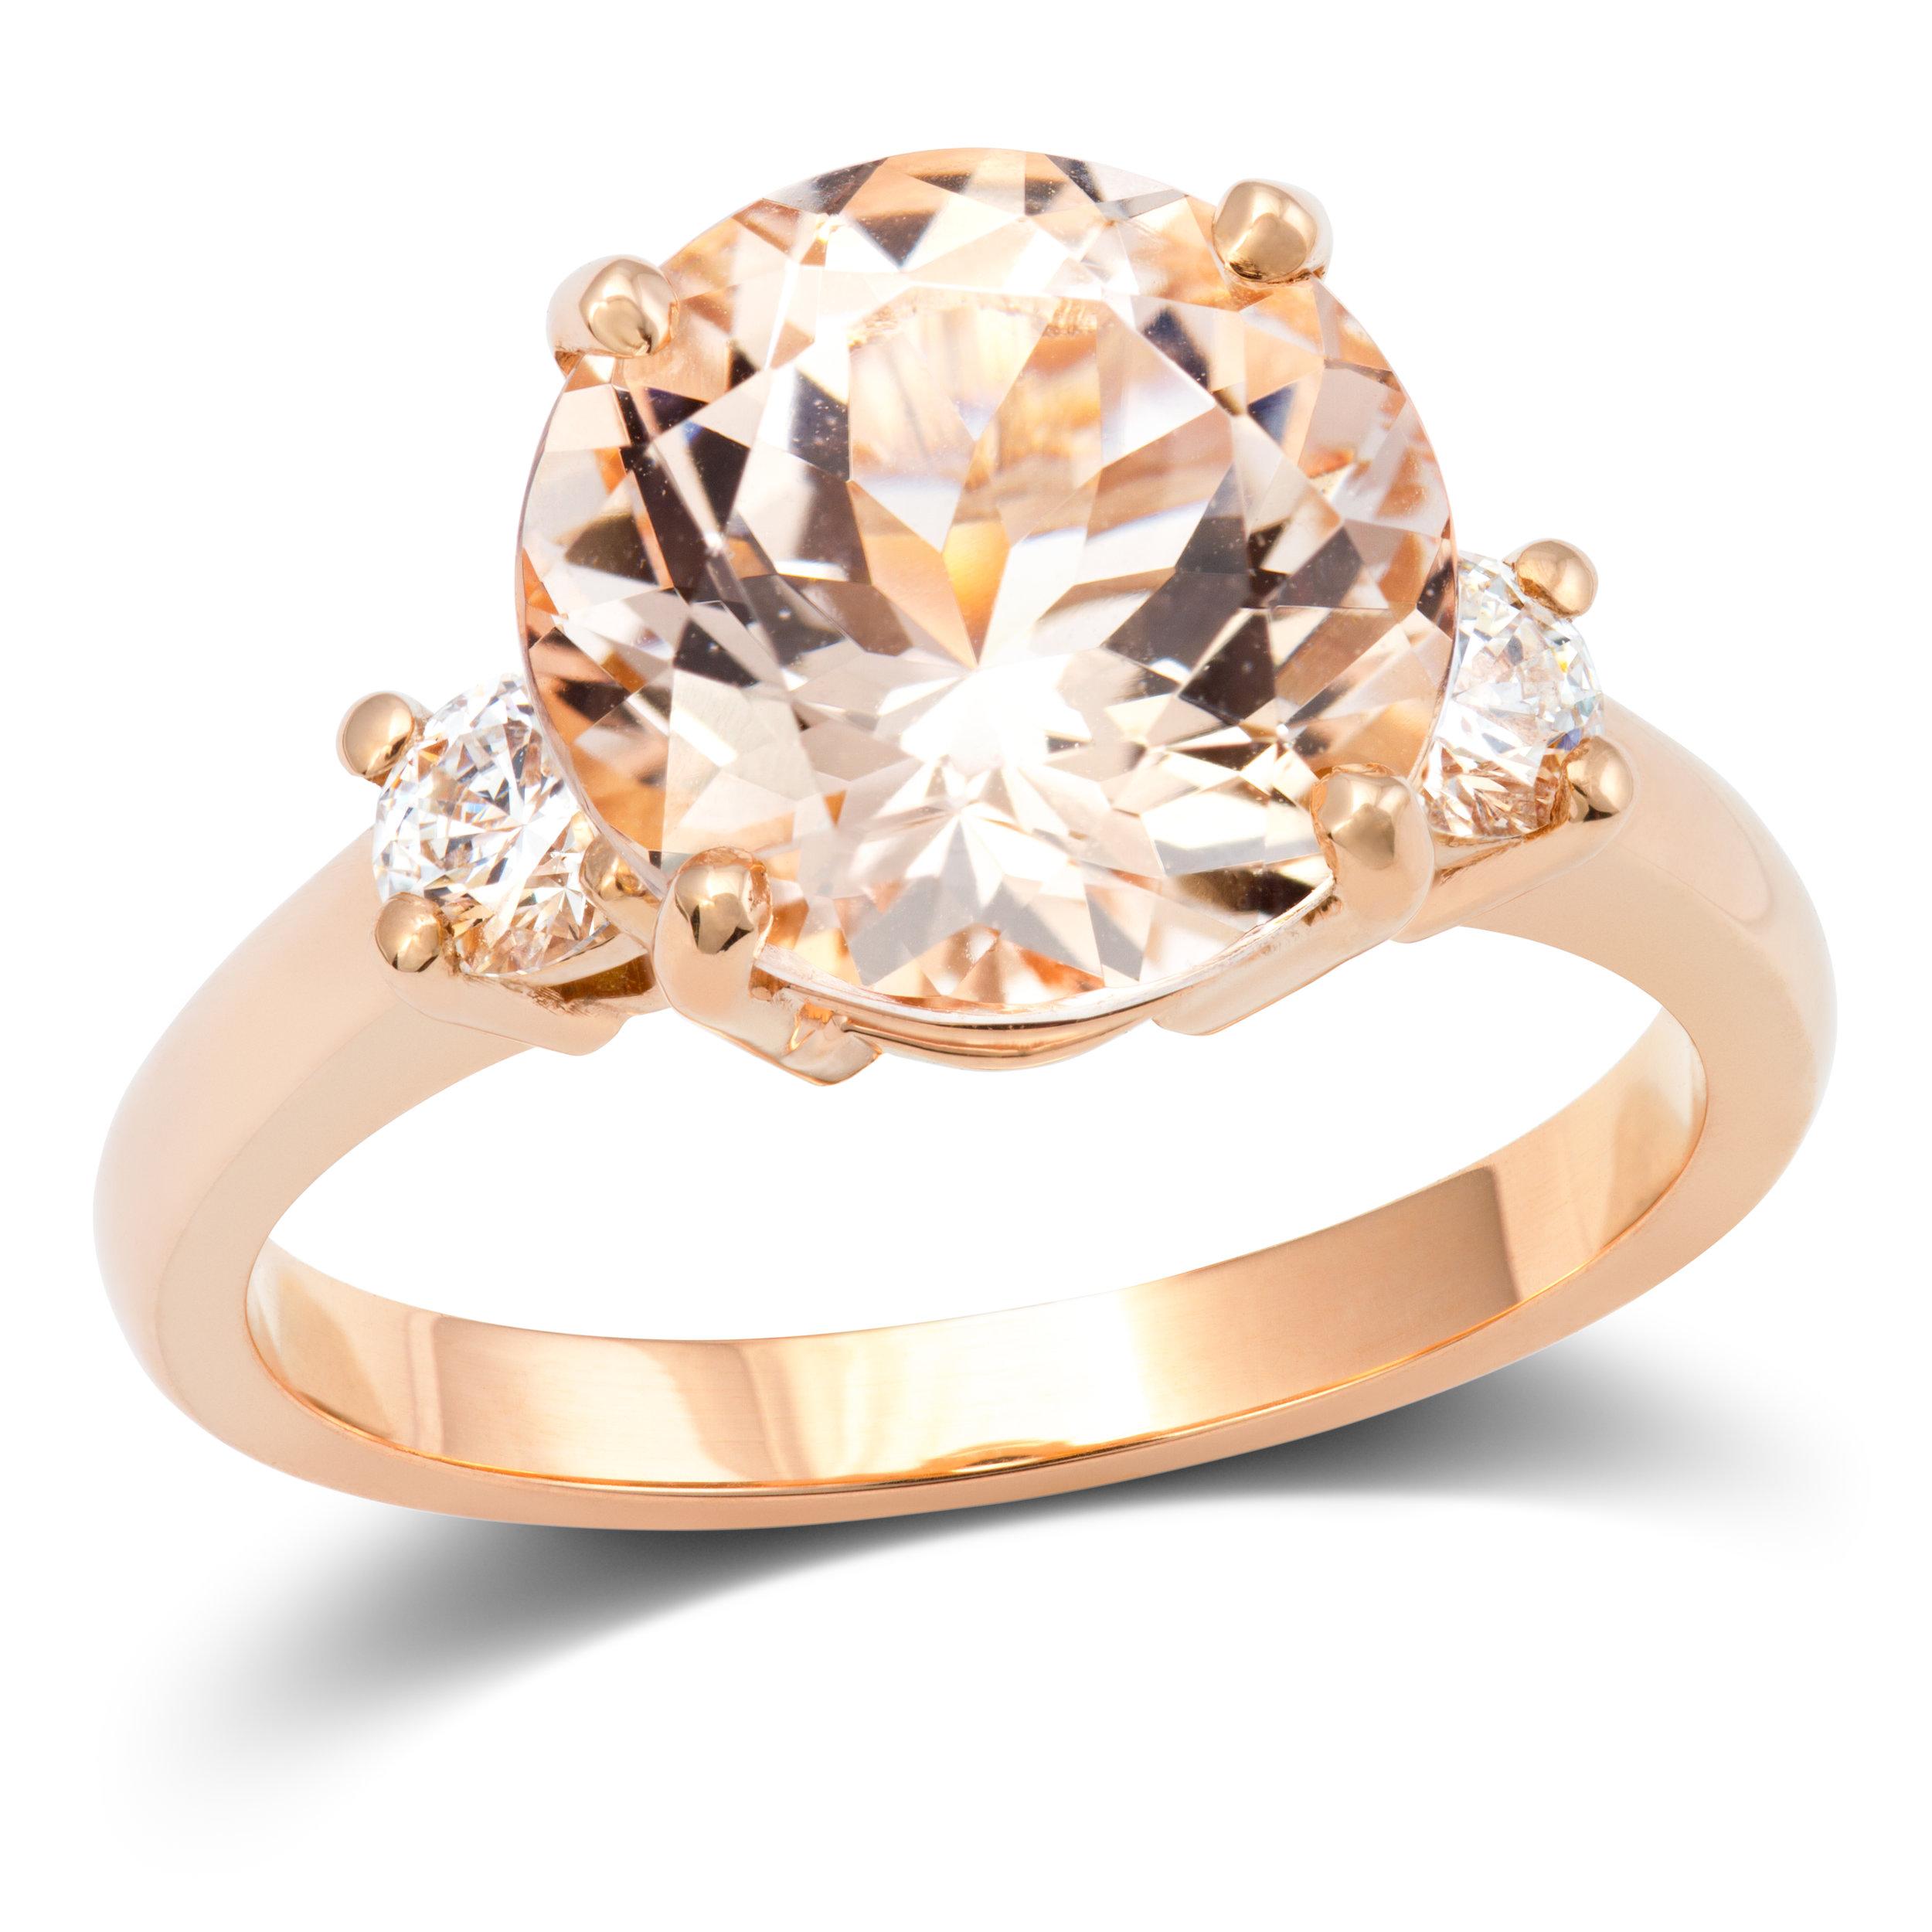 18ct rose gold, morganite and diamond ring - £2,769